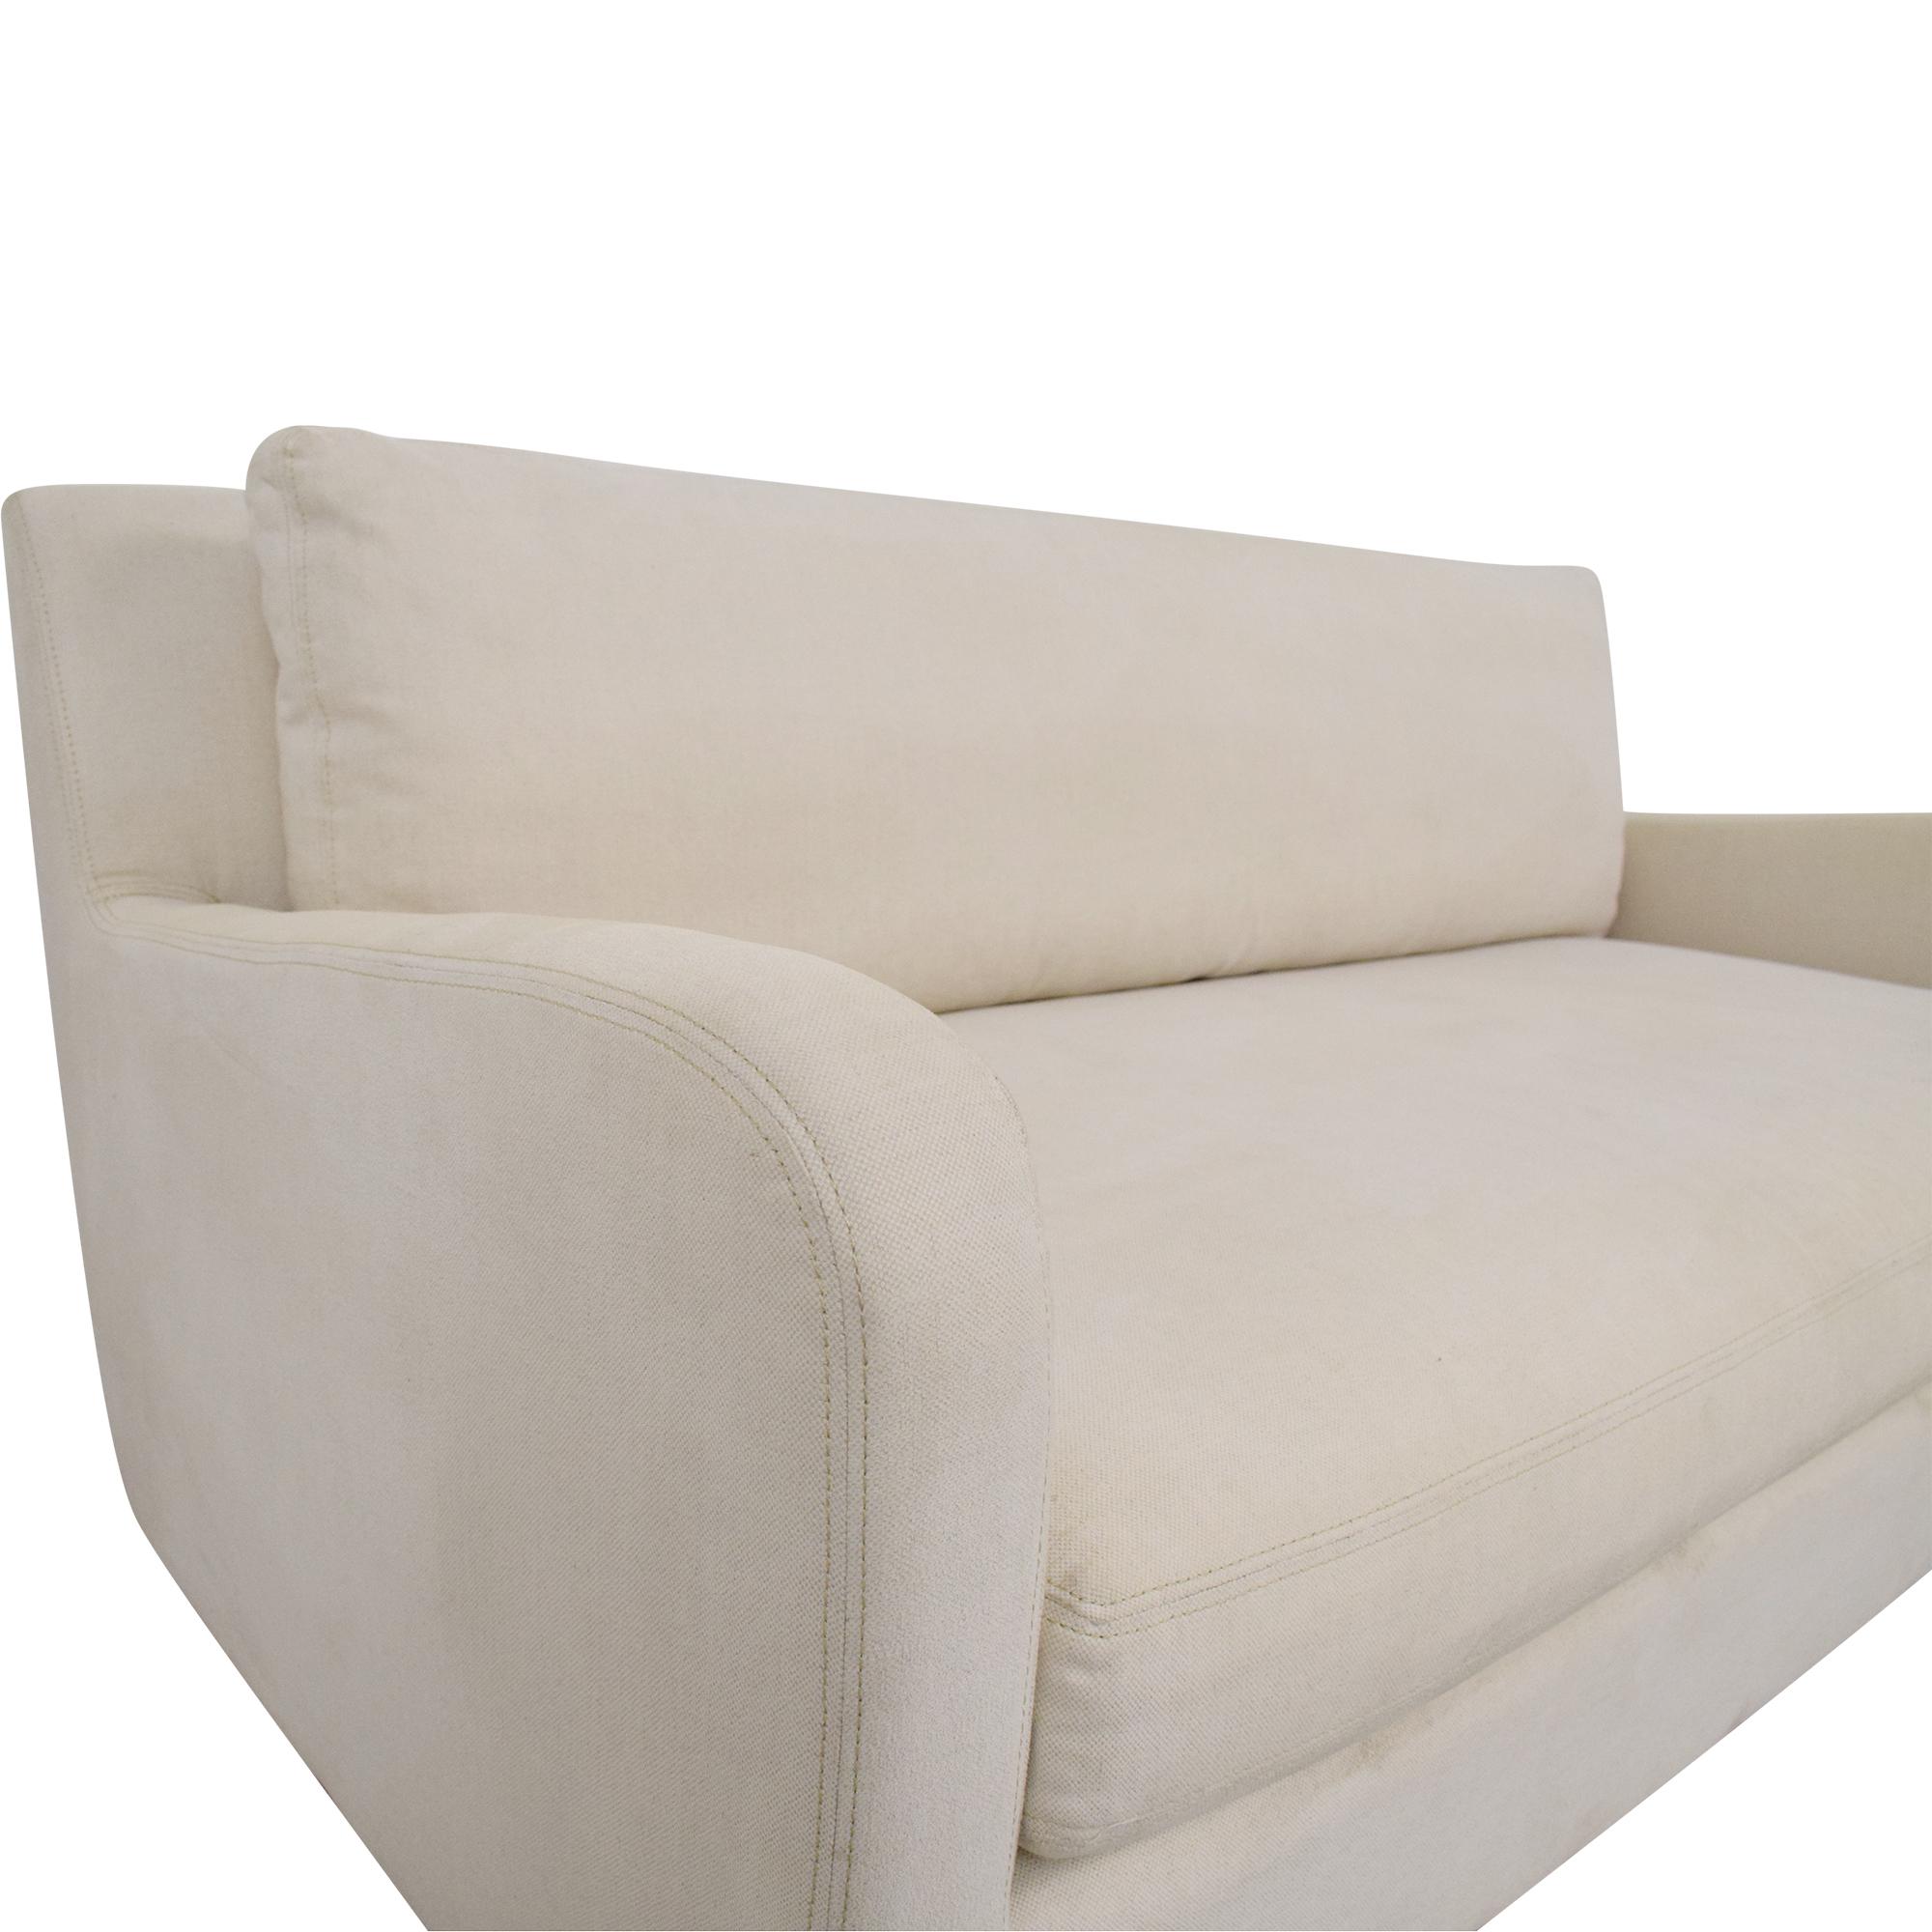 buy Restoration Hardware Belgian Slope Arm Sofa Restoration Hardware